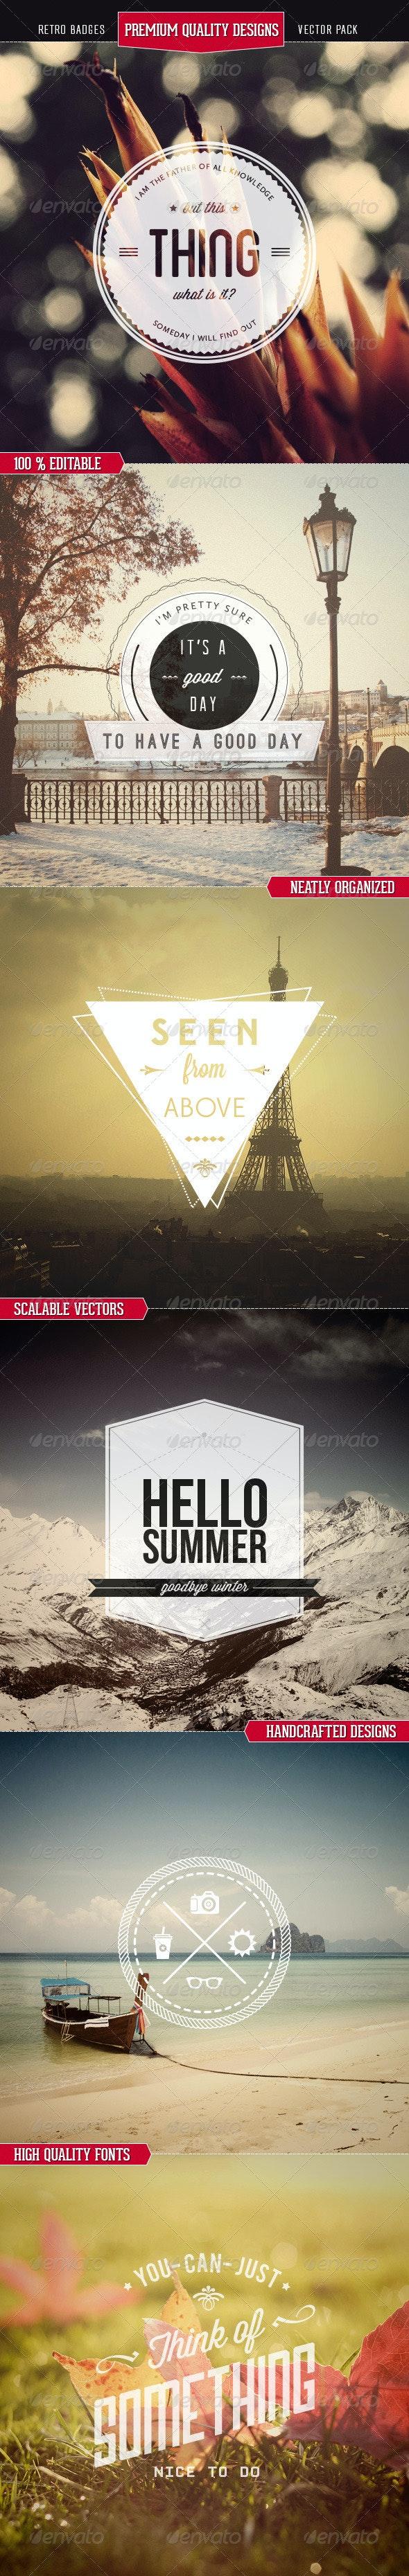 Premium Quality - Retro Badges Vectors - Retro Technology